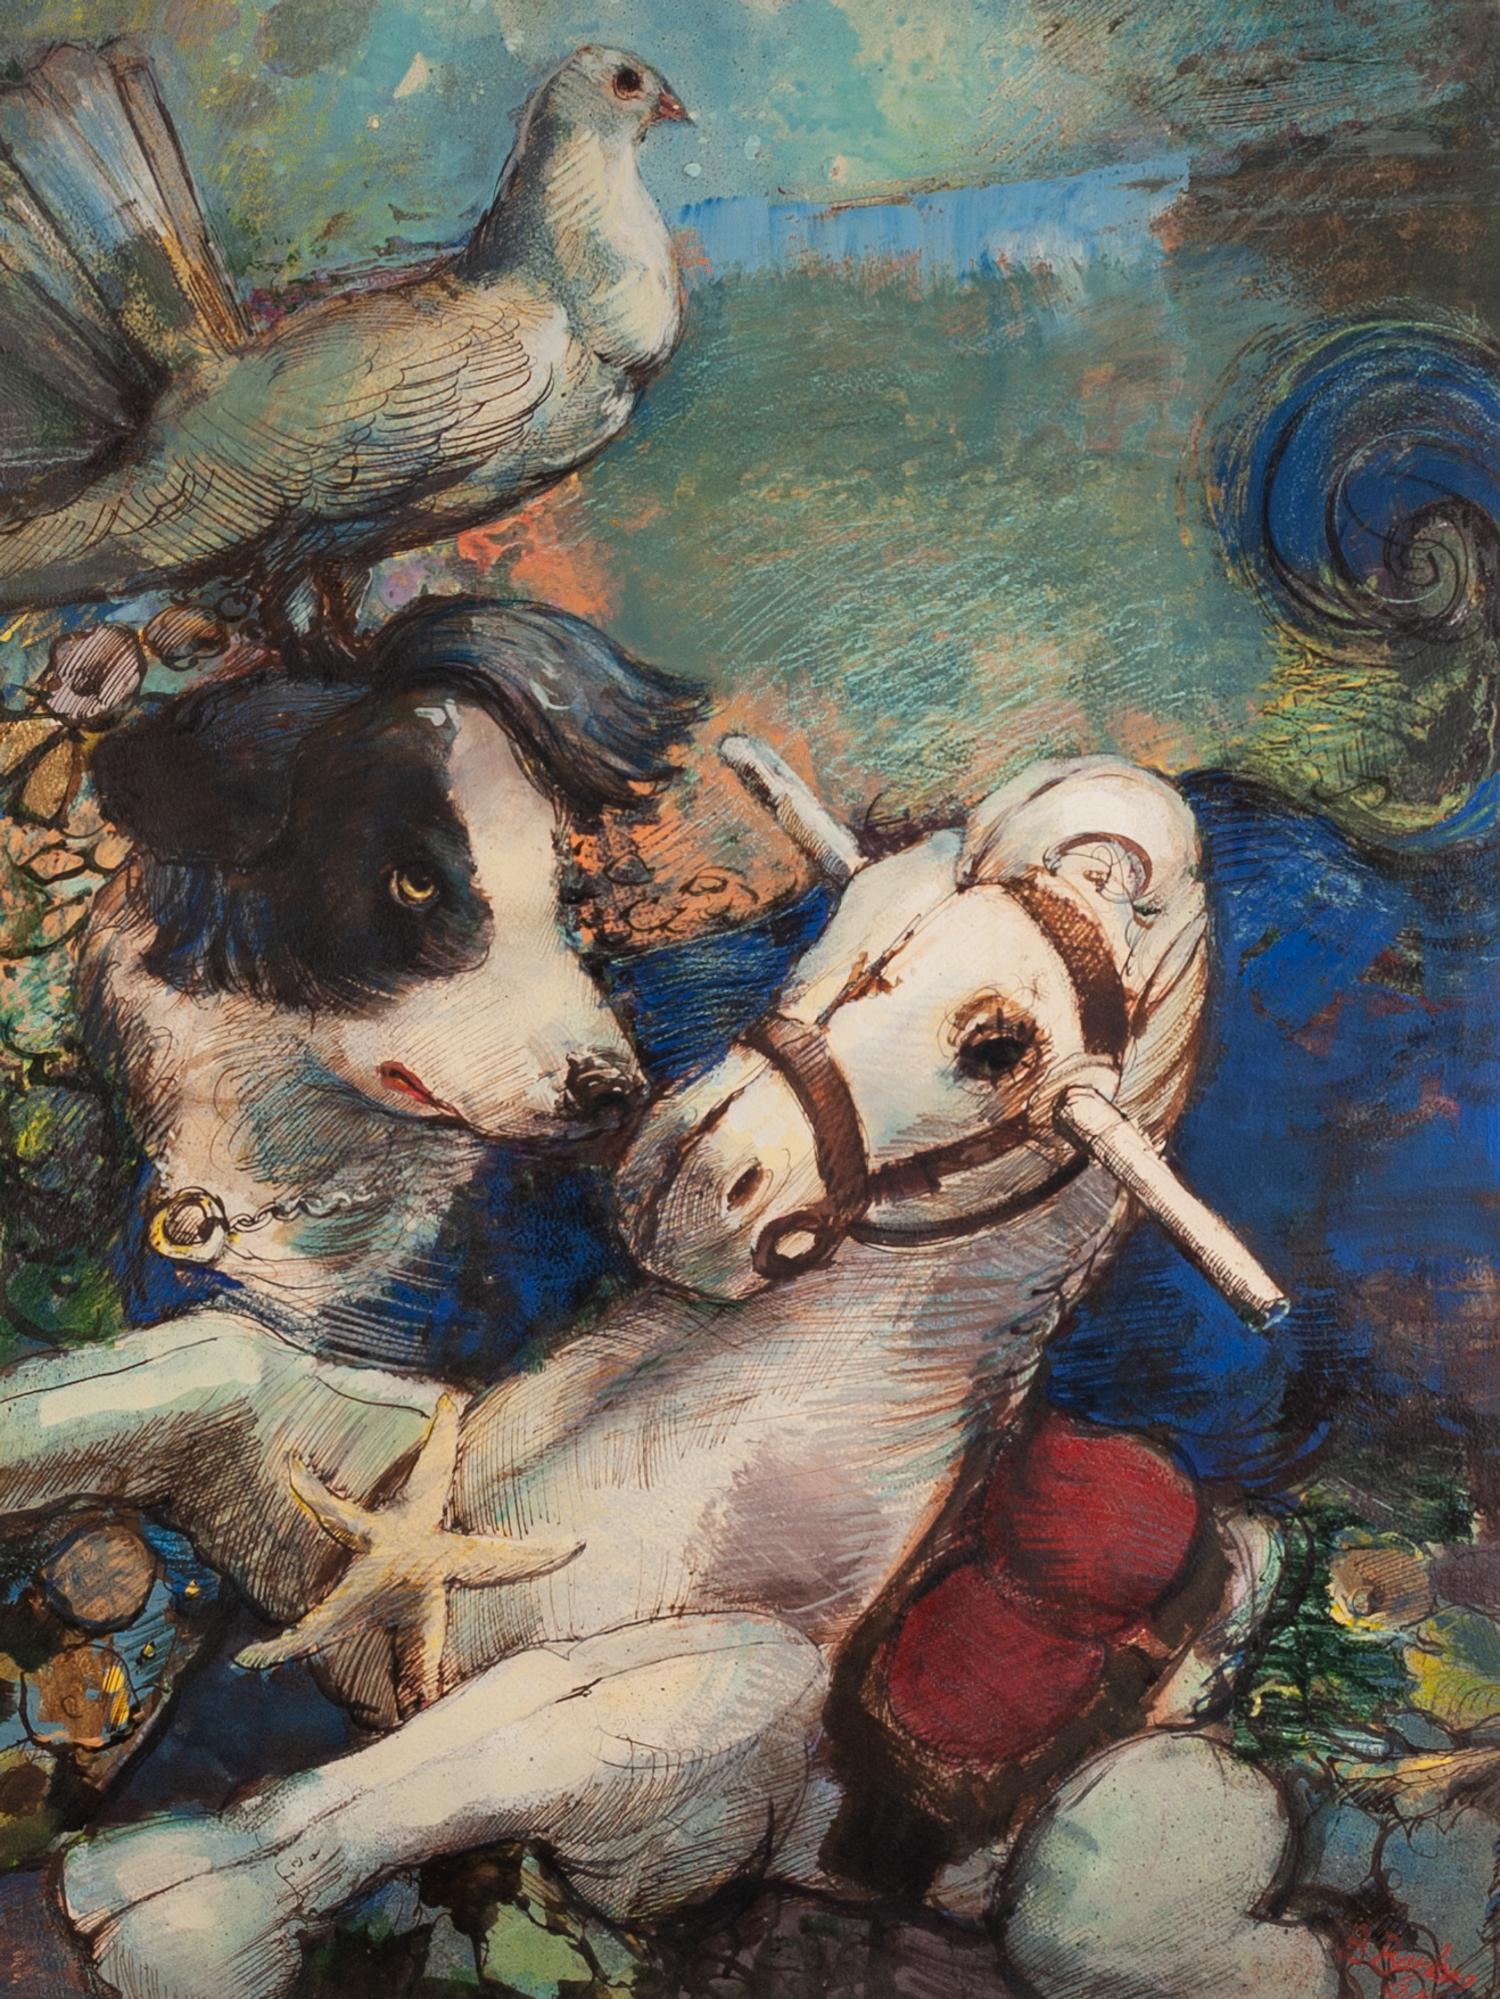 Lot 13 - BOHUSLAV BARLOW (b.1947) WATERCOLOUR AND INK ?Celestial Games?, rocking horse, dog and a pigeon